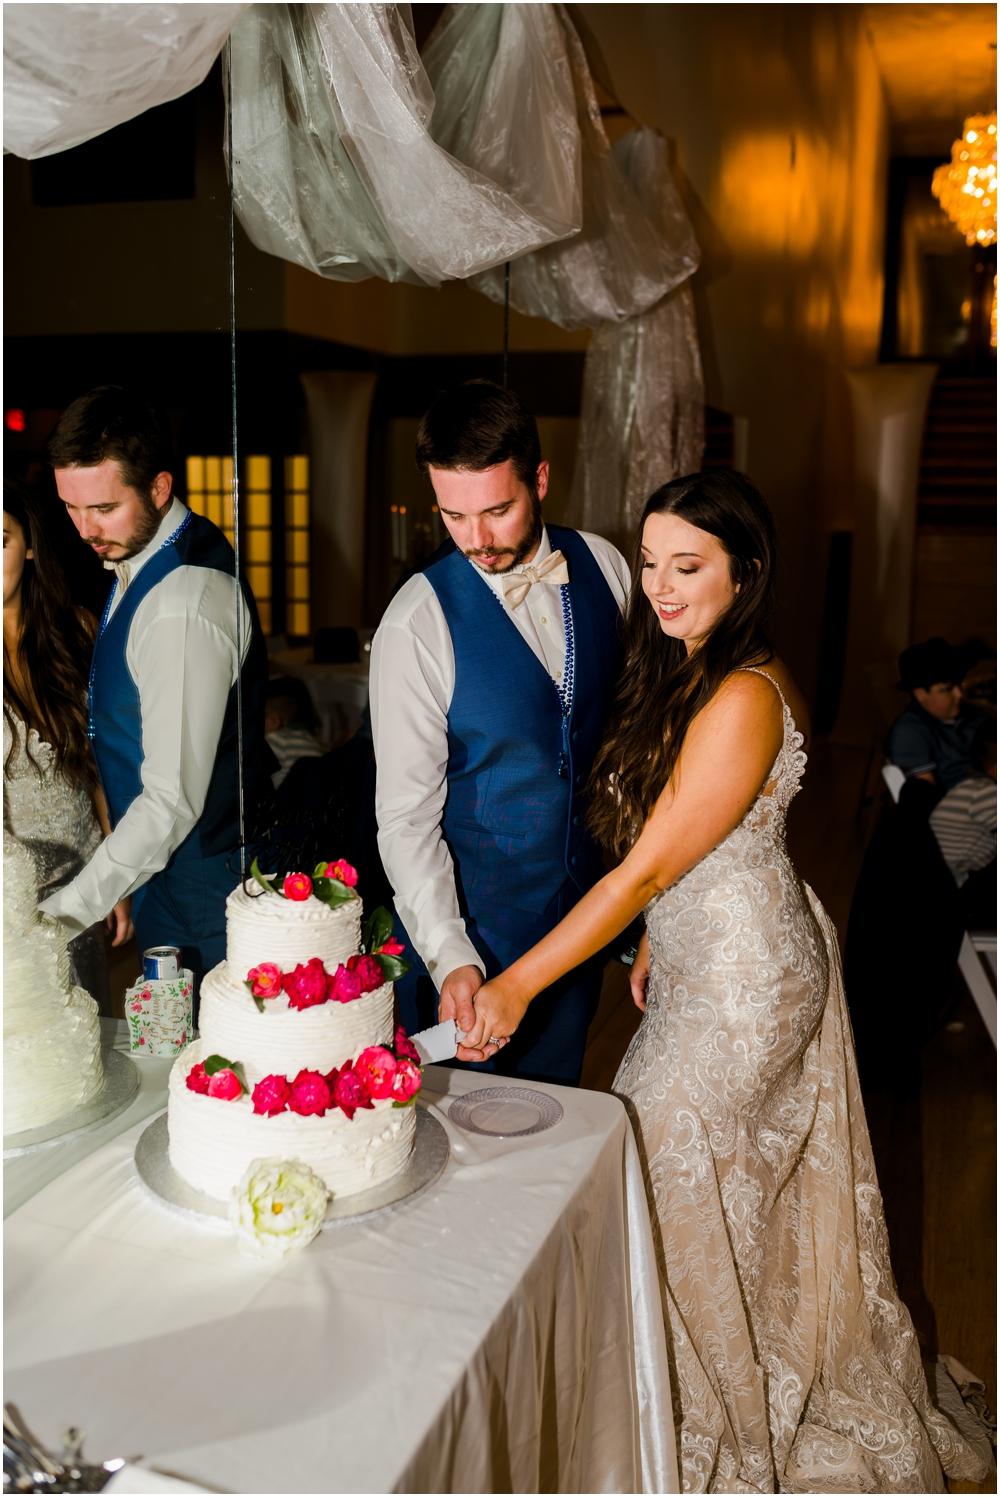 martin-wedding-panama-city-beach-florida-kiersten-stevenson-photography-101.jpg